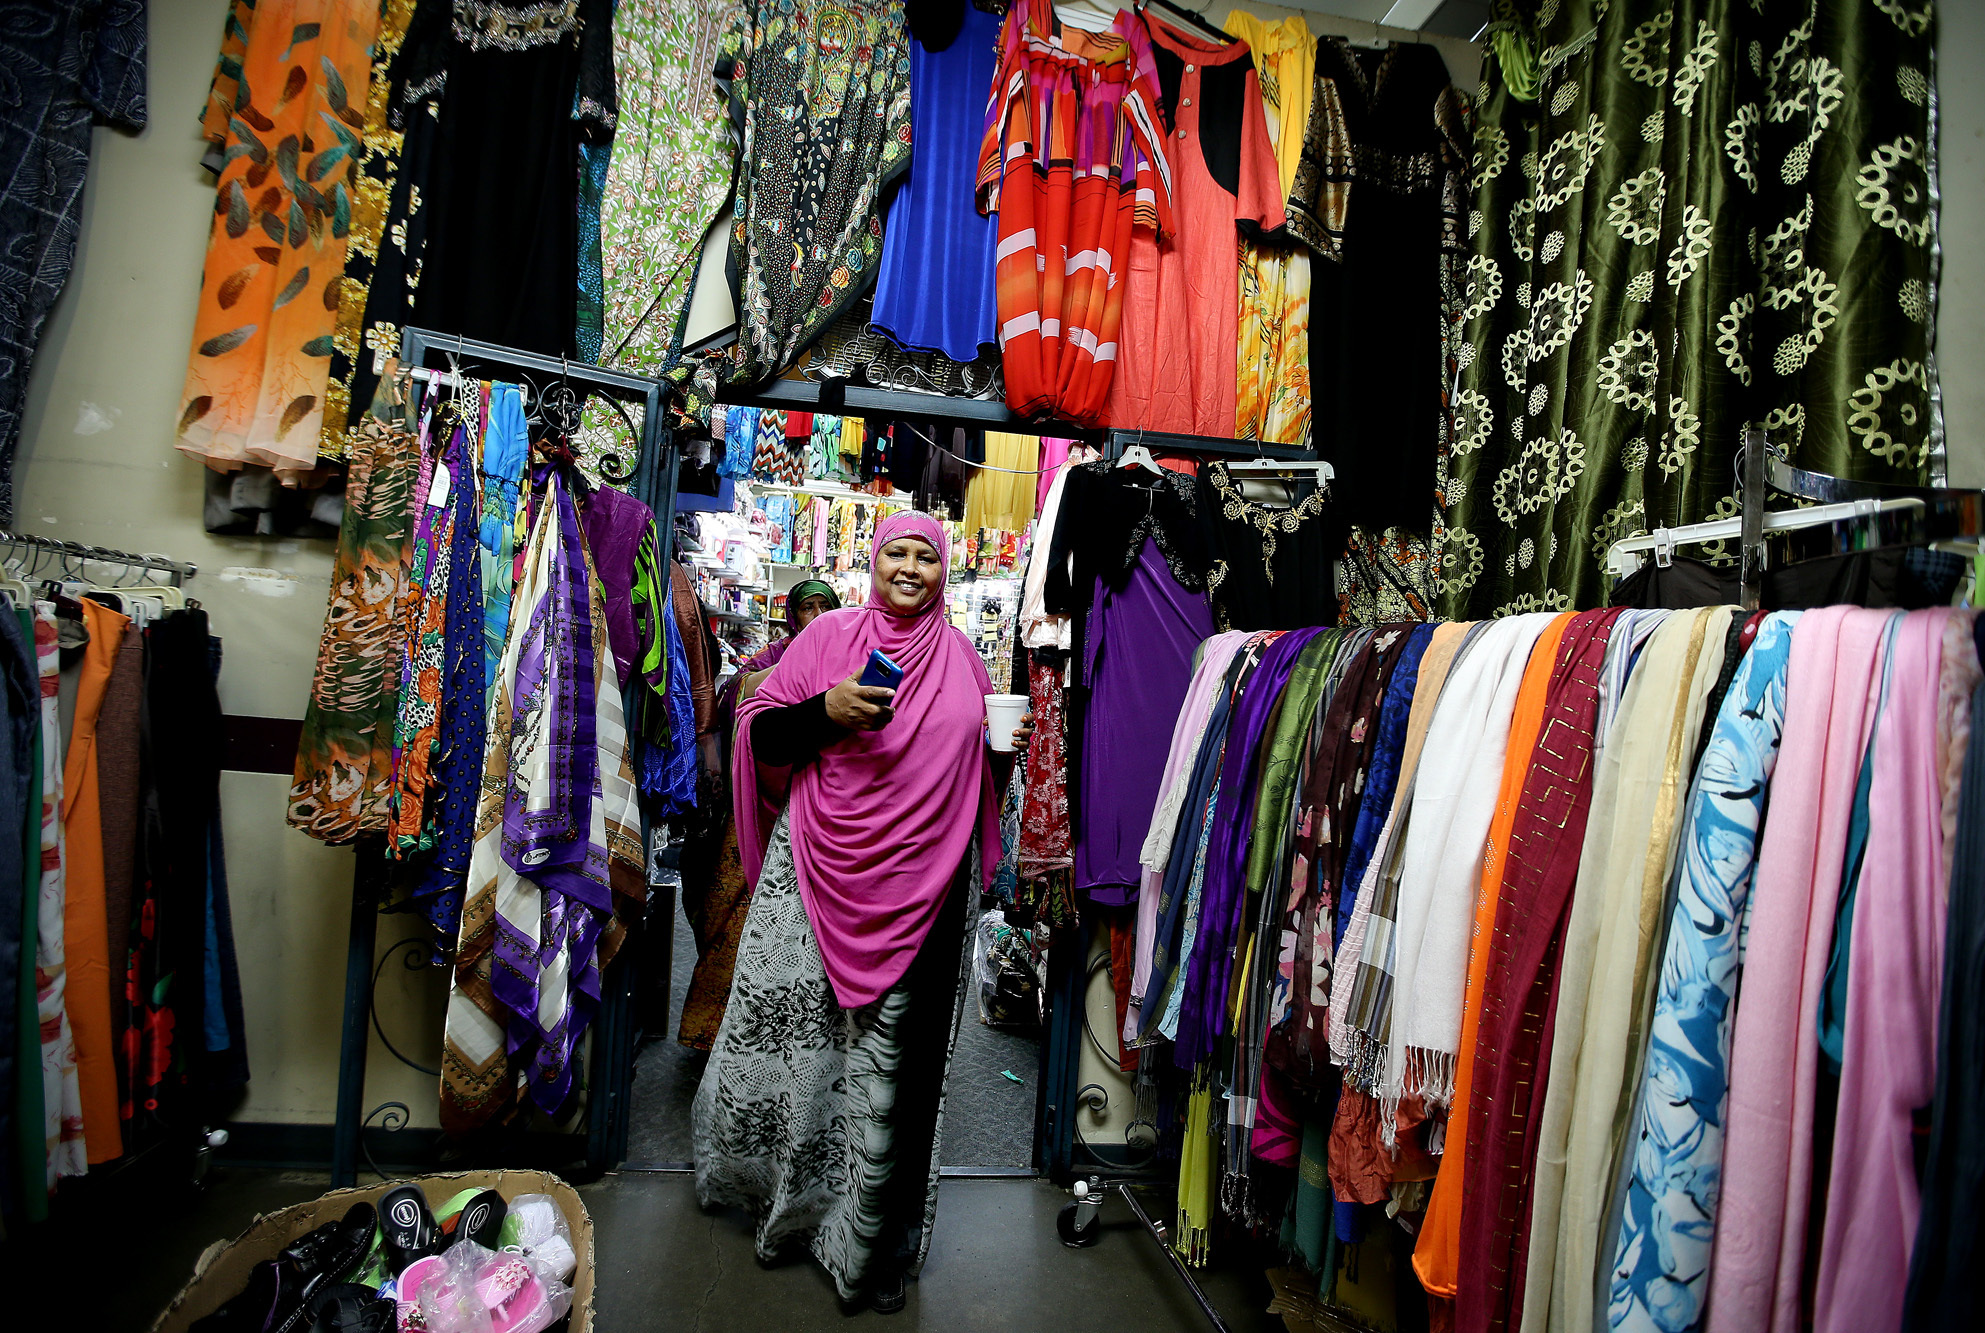 photo from oldschoolhijabi.com